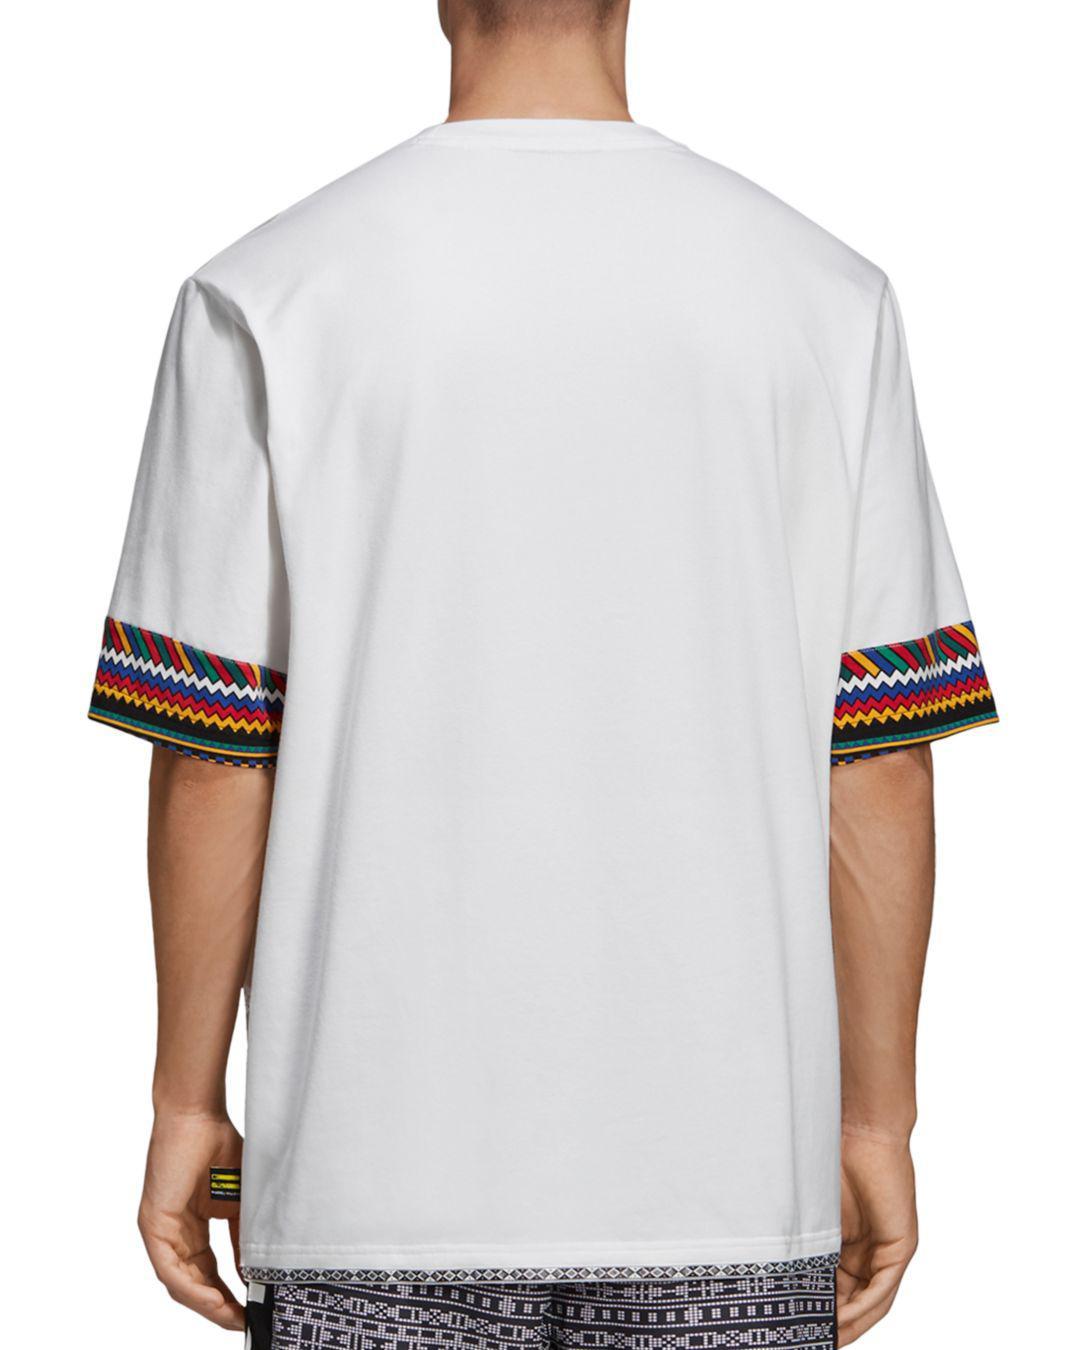 53fa93209 adidas Originals X Pharrell Williams Solar Hu Trefoil Tee in White for Men  - Lyst